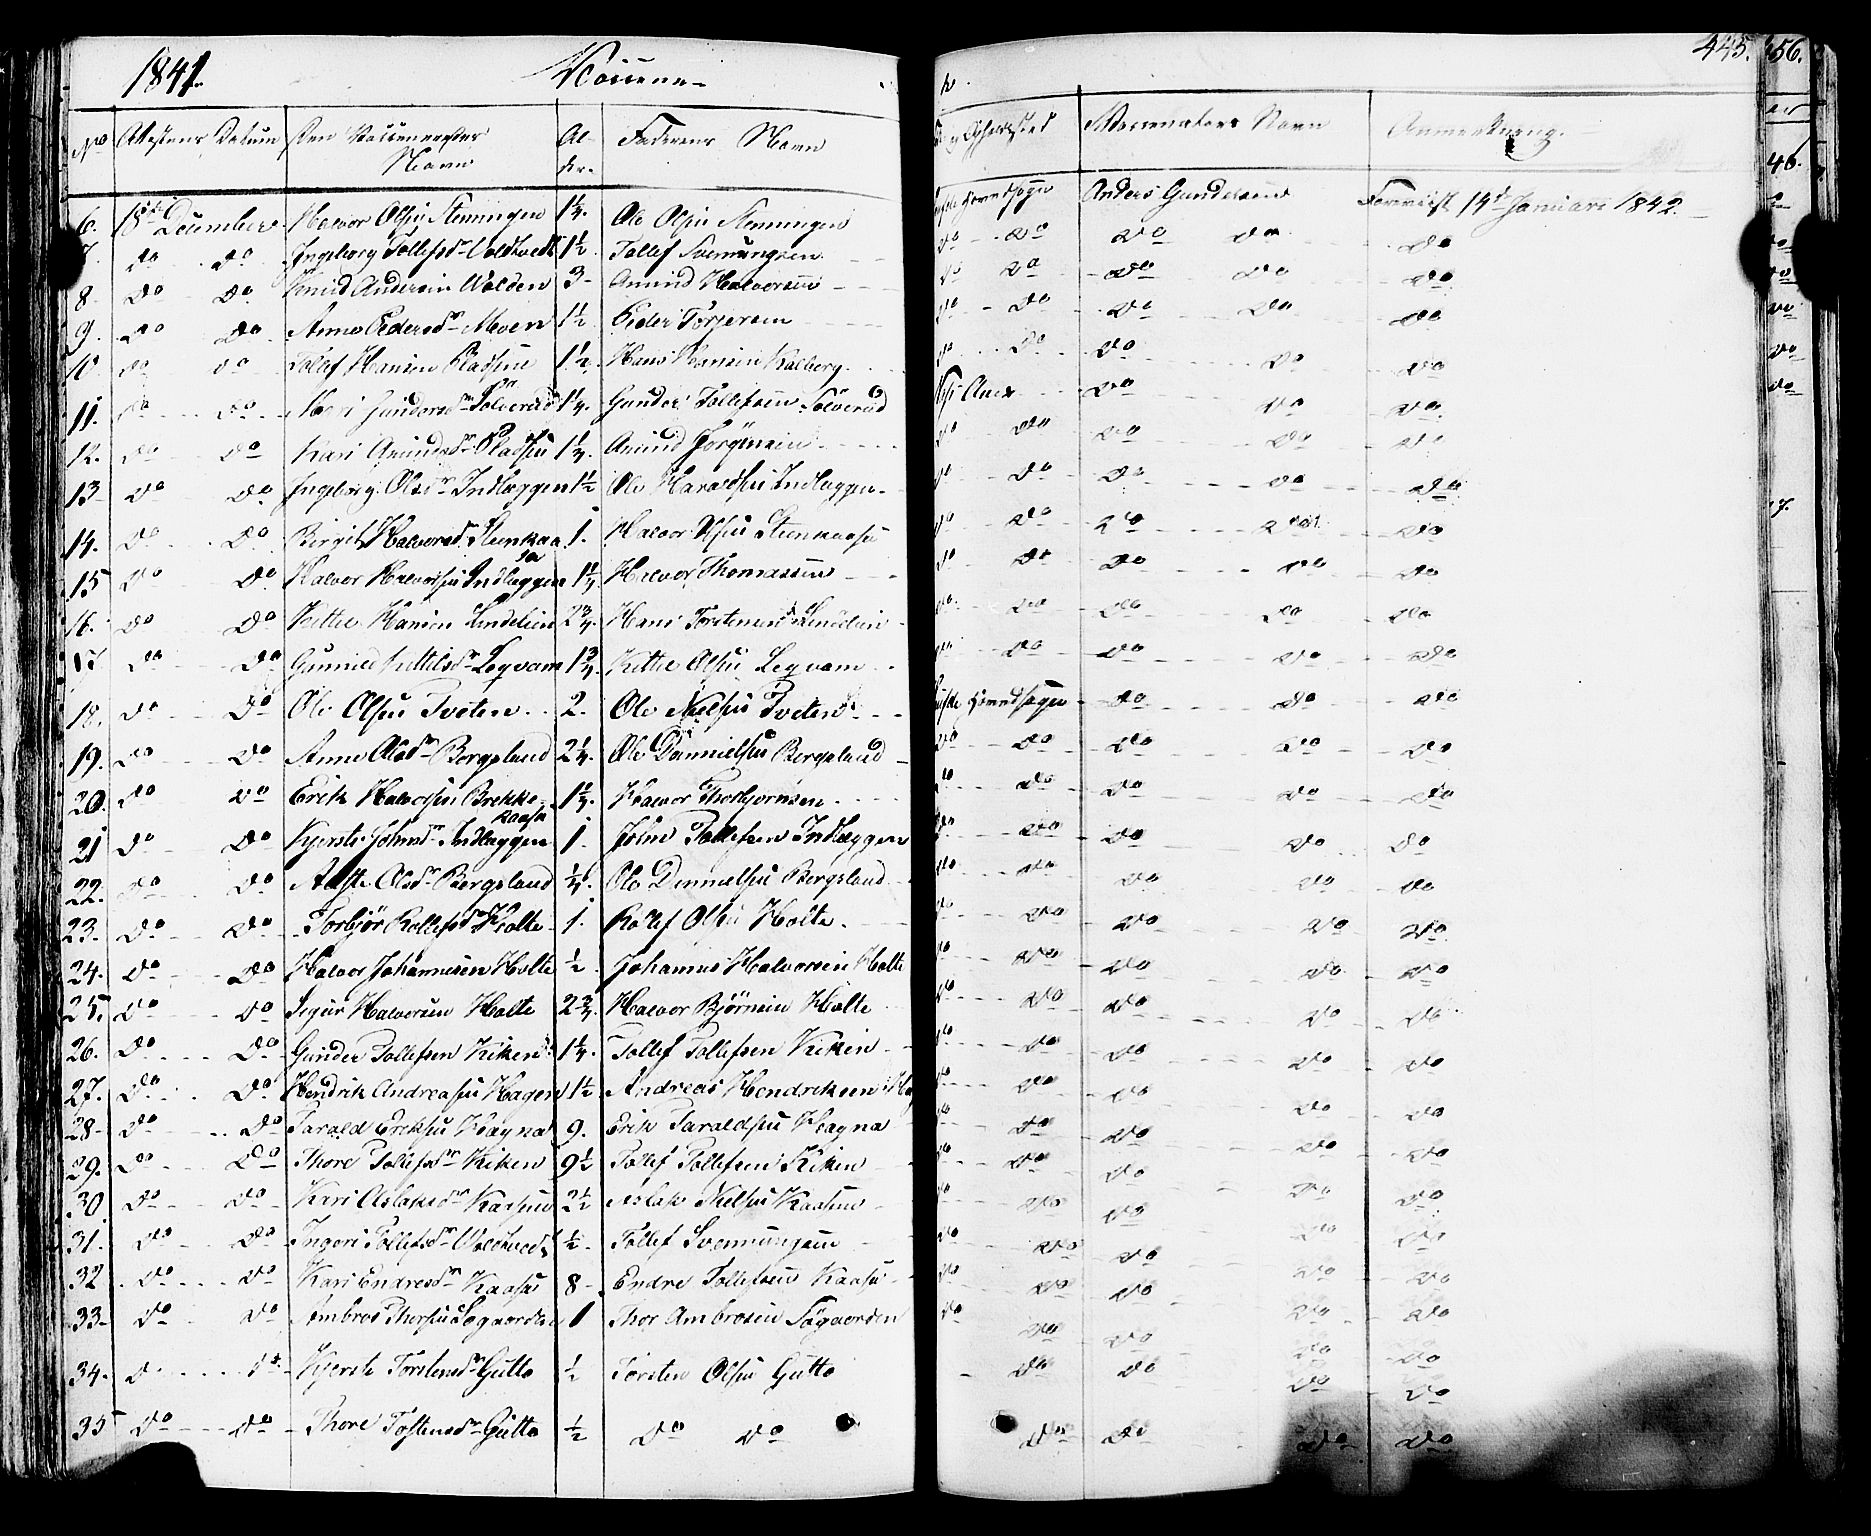 SAKO, Sauherad kirkebøker, F/Fa/L0006: Ministerialbok nr. I 6, 1827-1850, s. 445